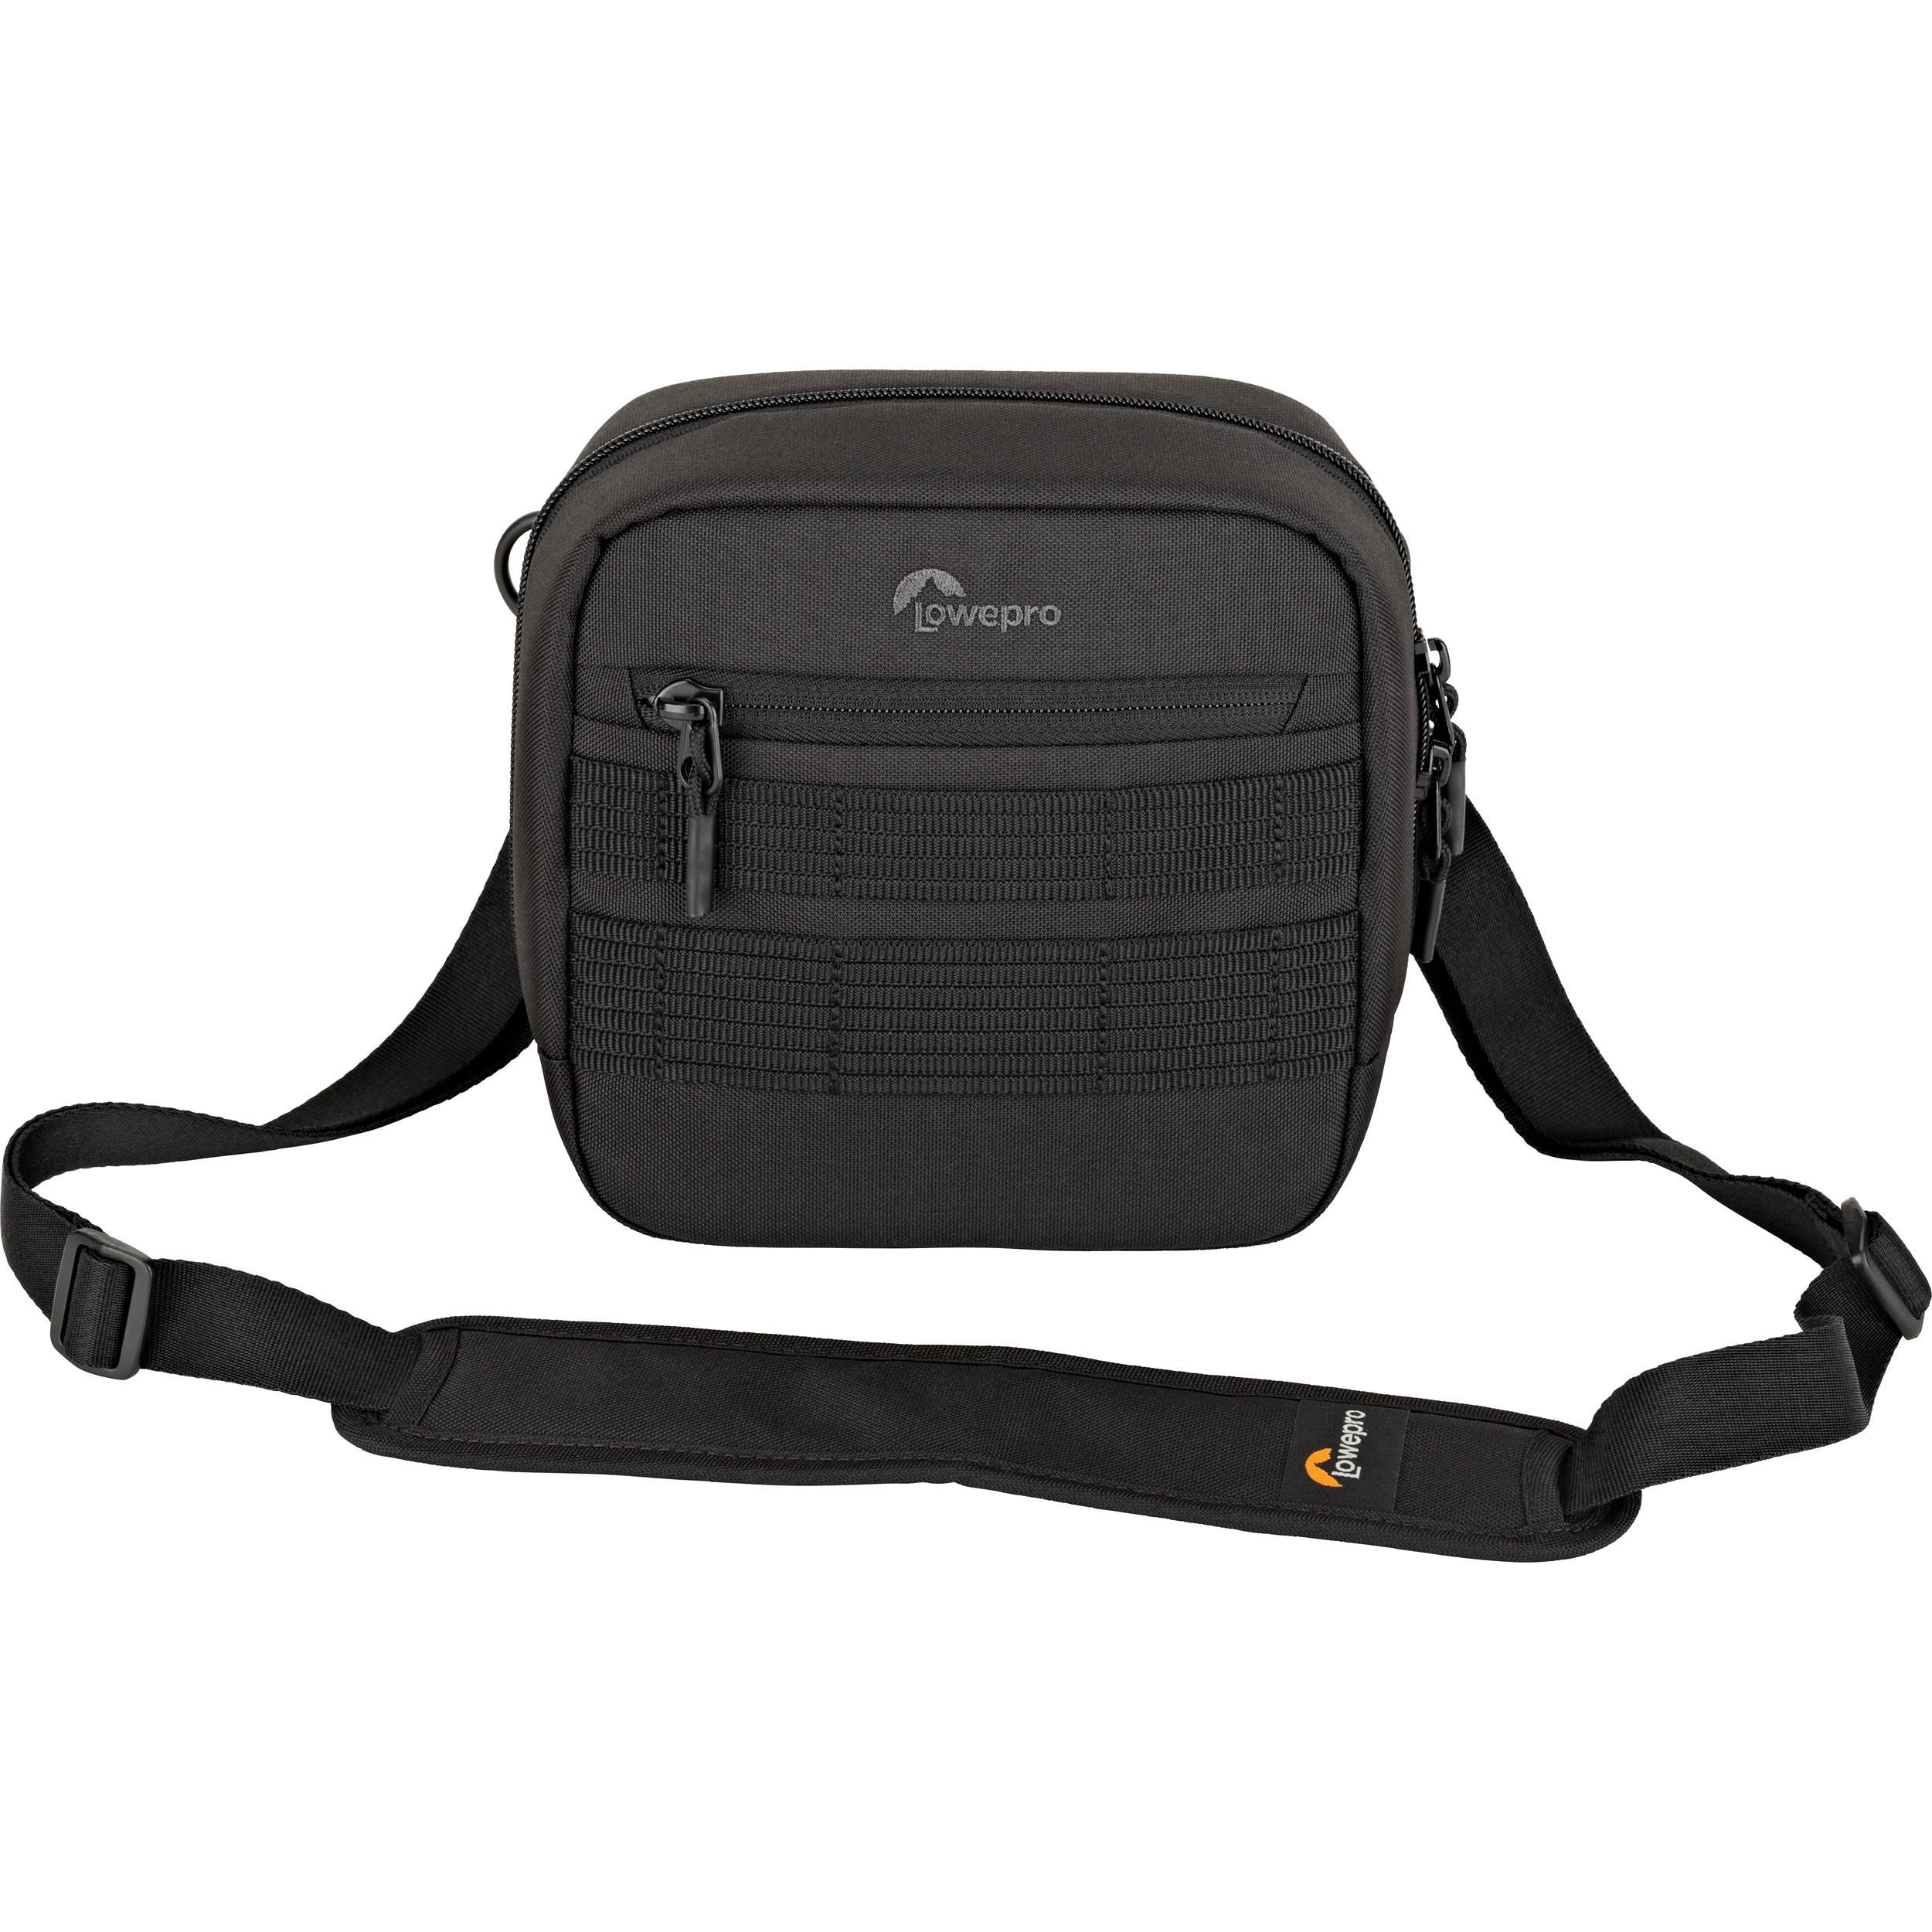 Lowepro Protactic Utility Bag 100 Aw Black